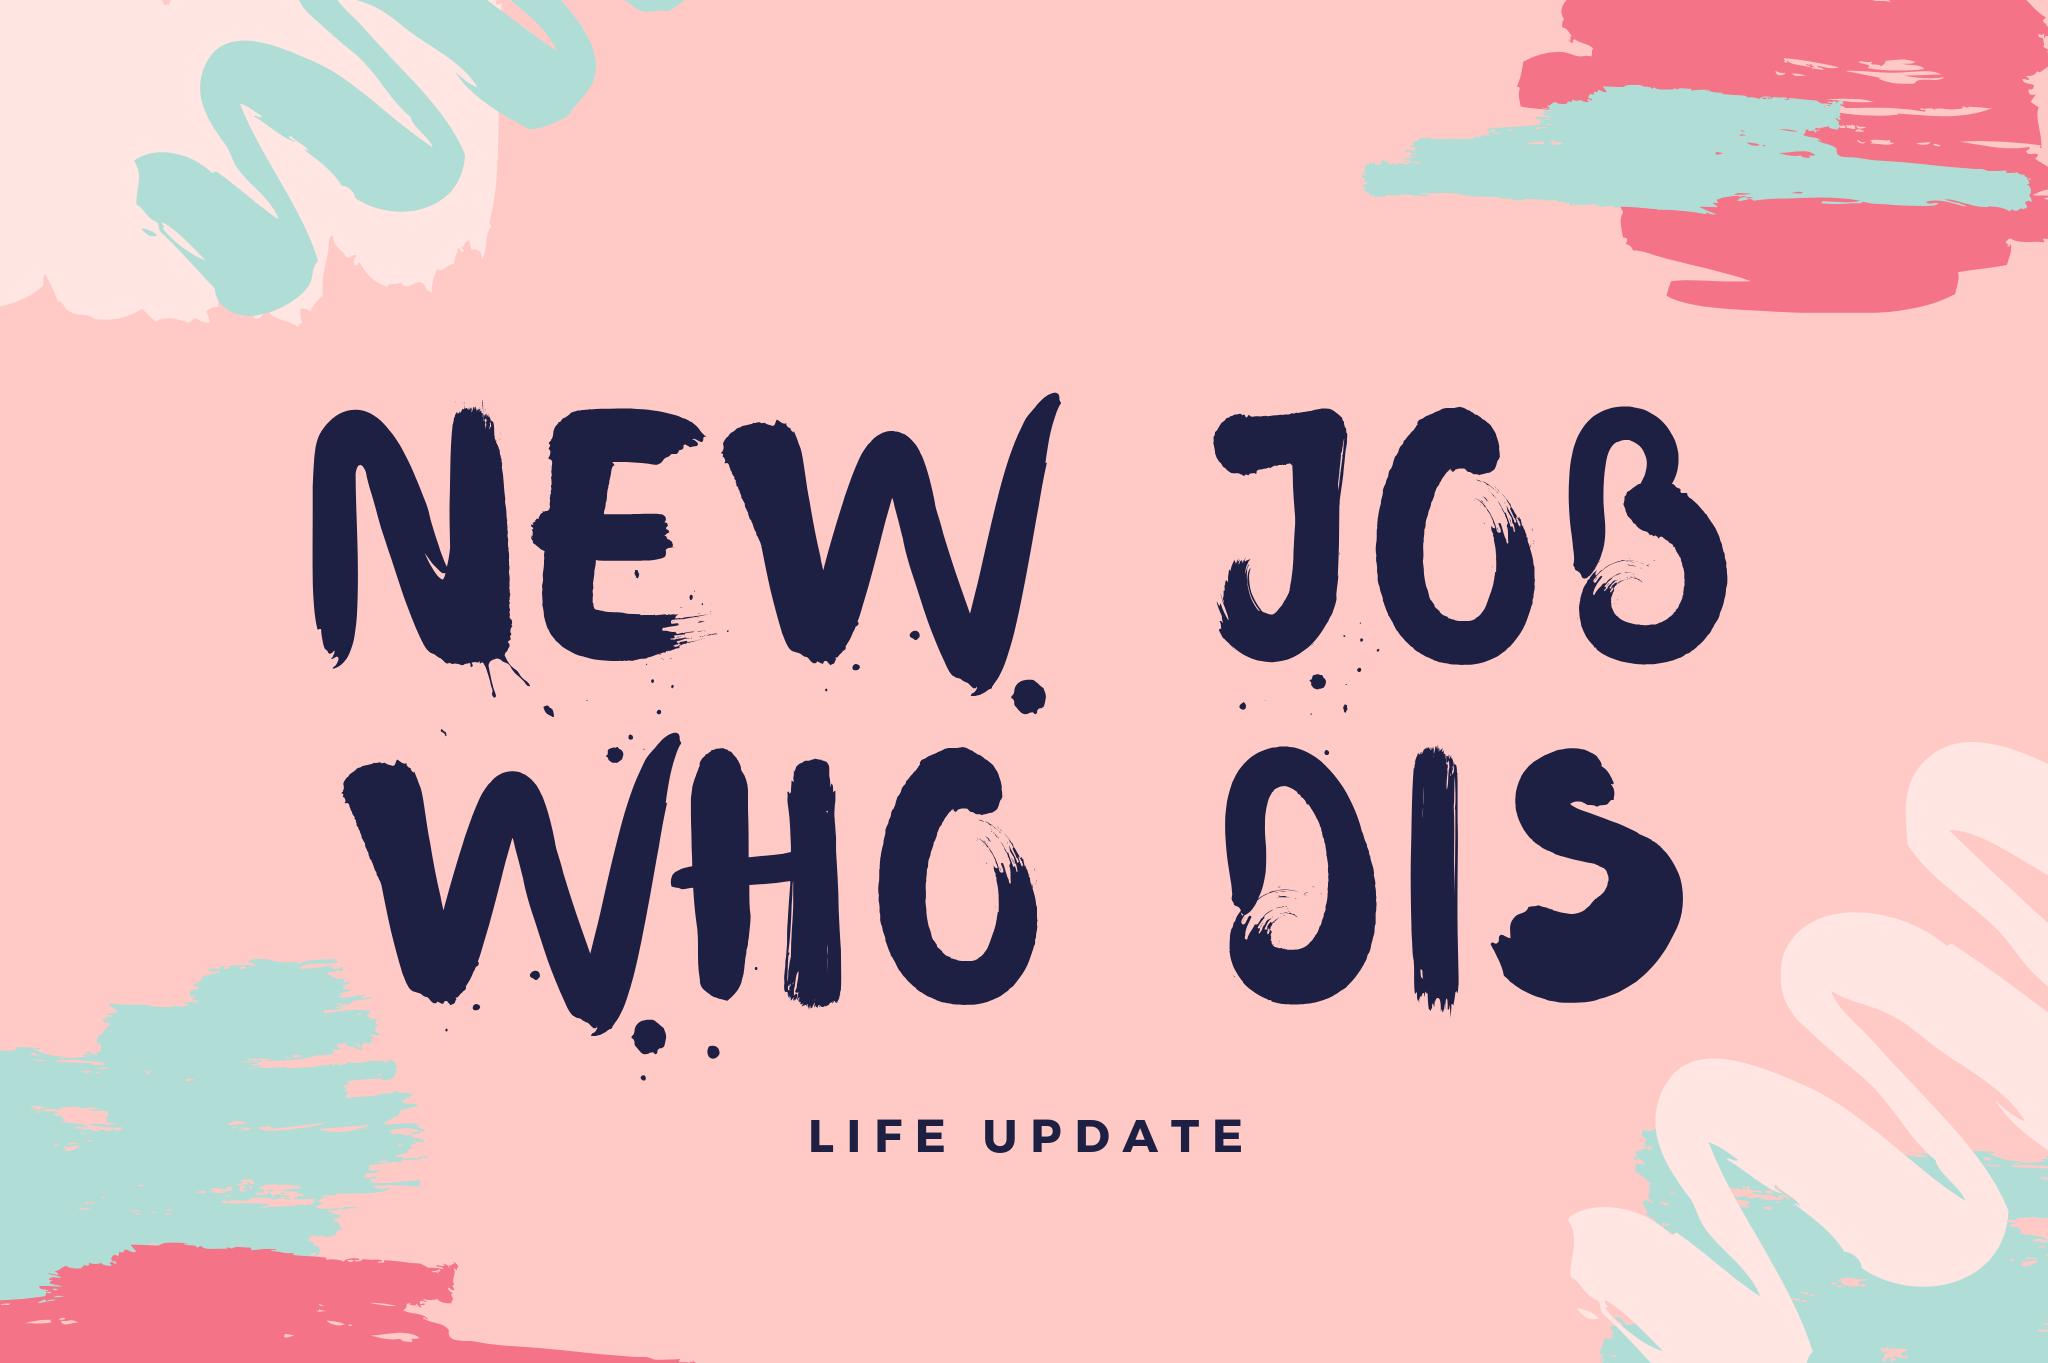 life update new job